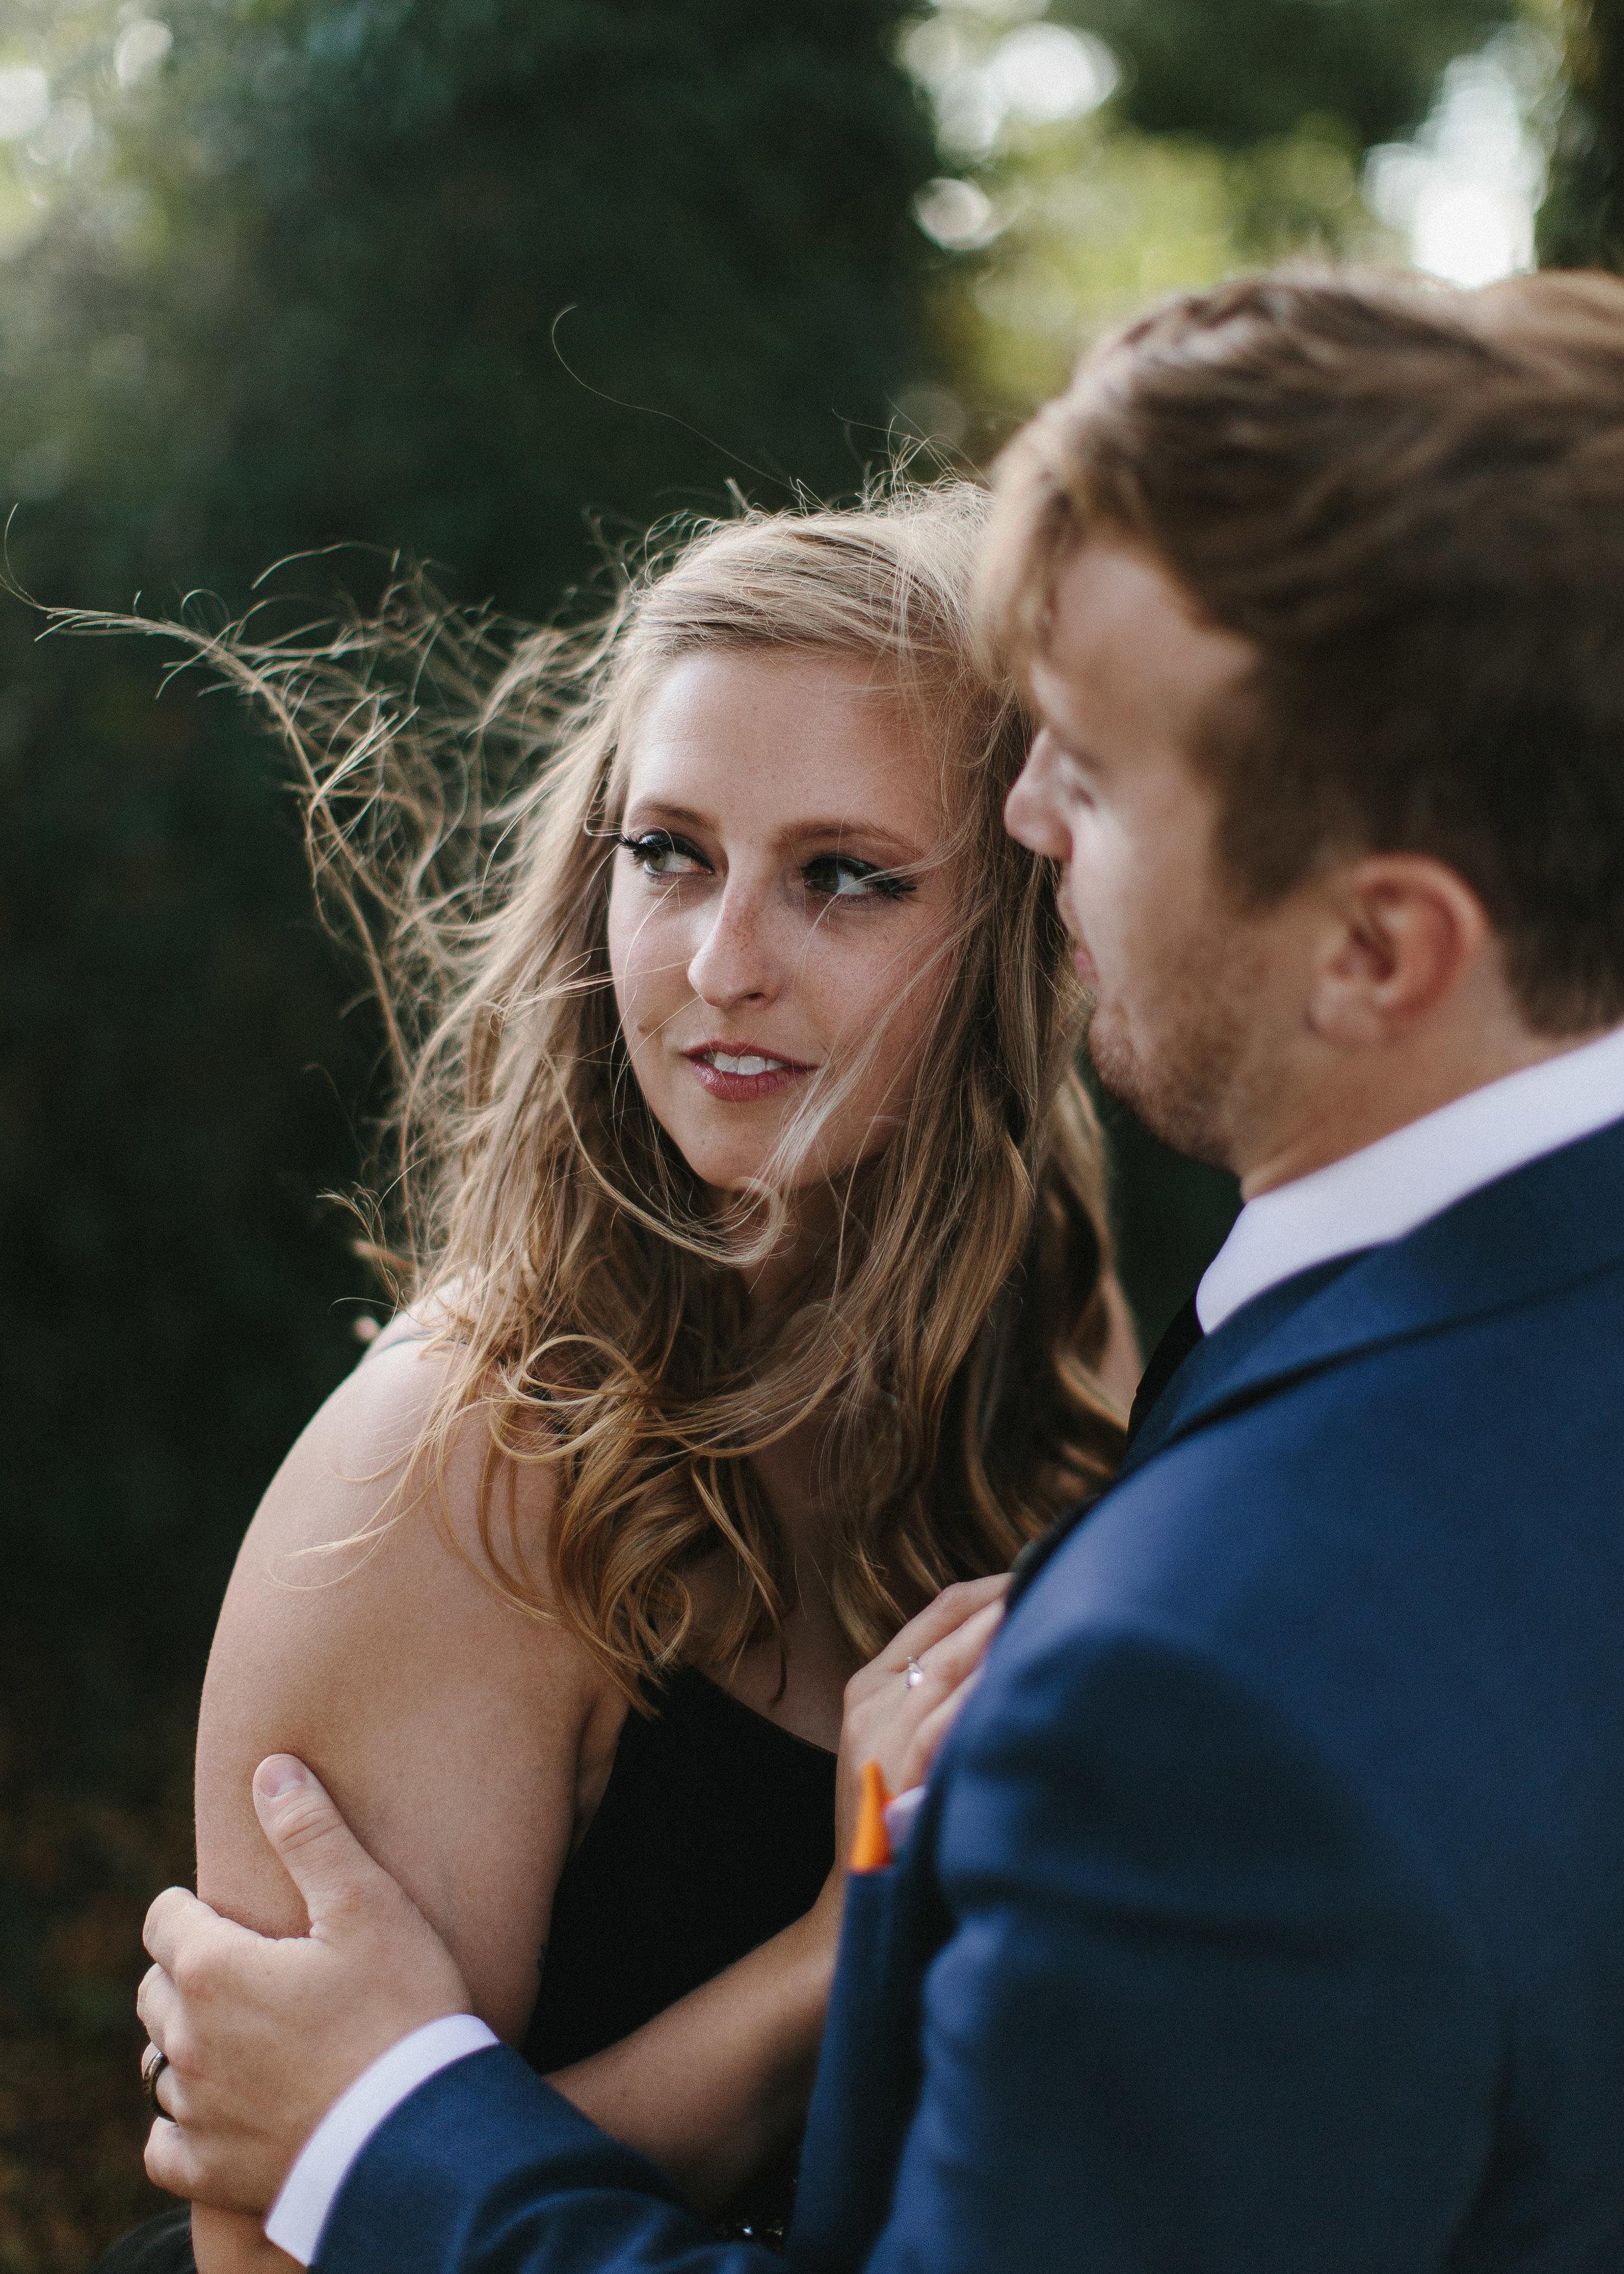 ireland_elopement_black_wedding_dress_wicklow_glendalough_athy_st_kevins_way_1704.jpg